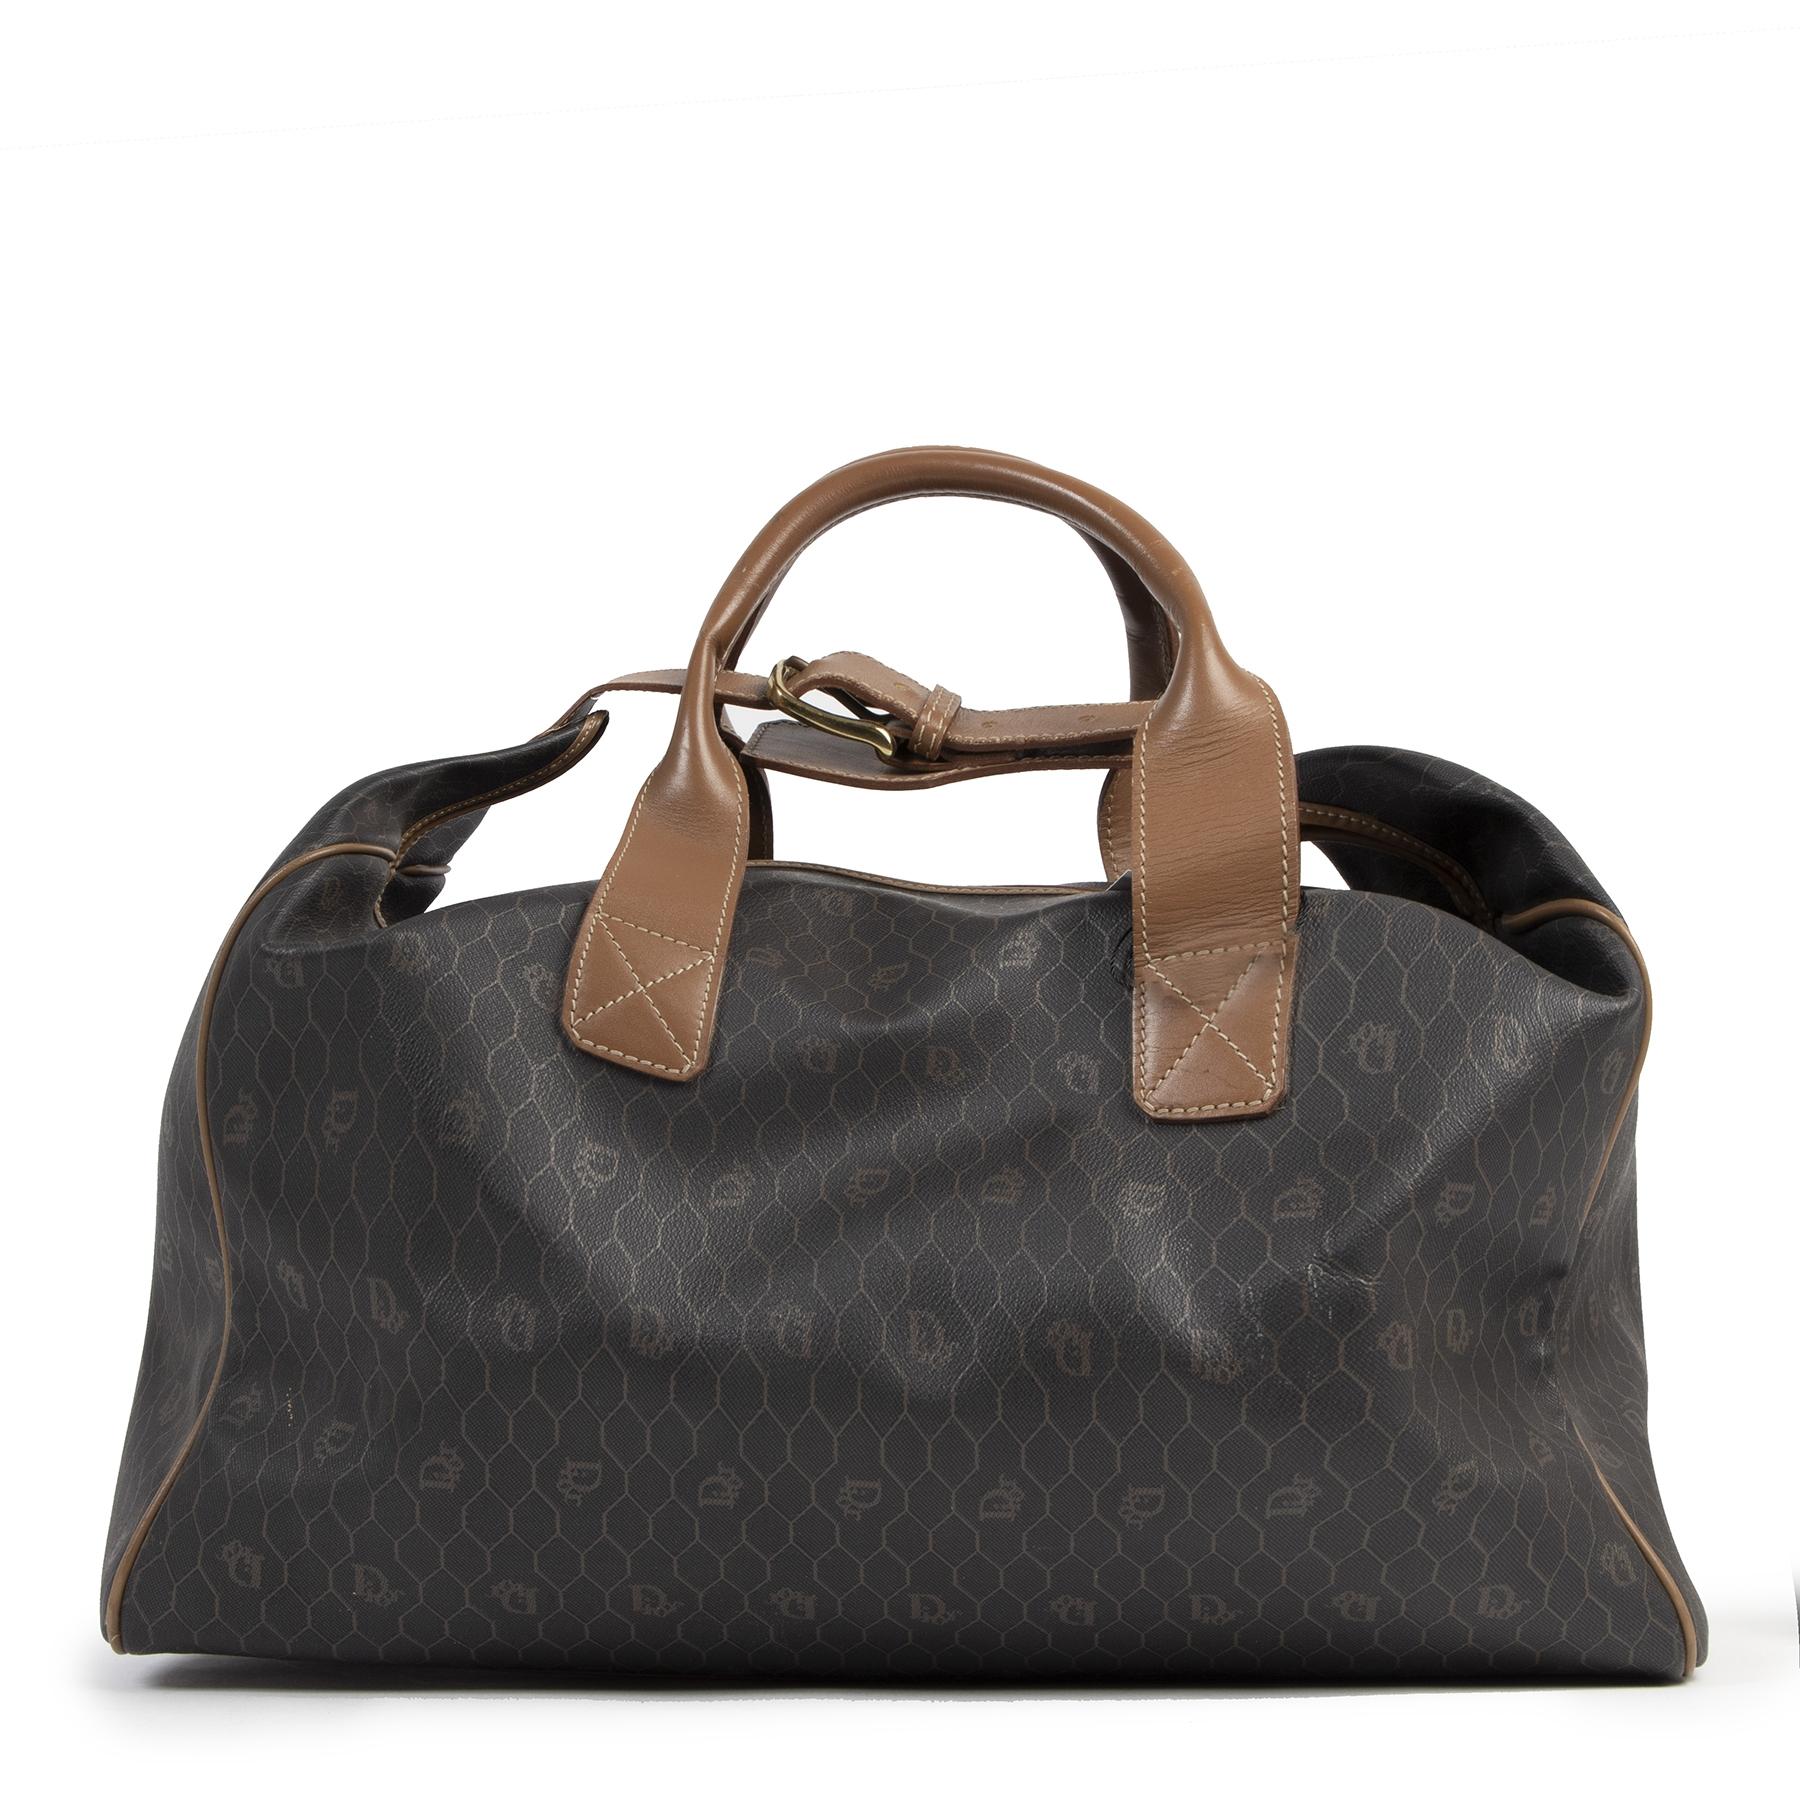 Authentic second-hand vintage Dior Grey Honeycomb Travel Bag buy online webshop LabelLOV